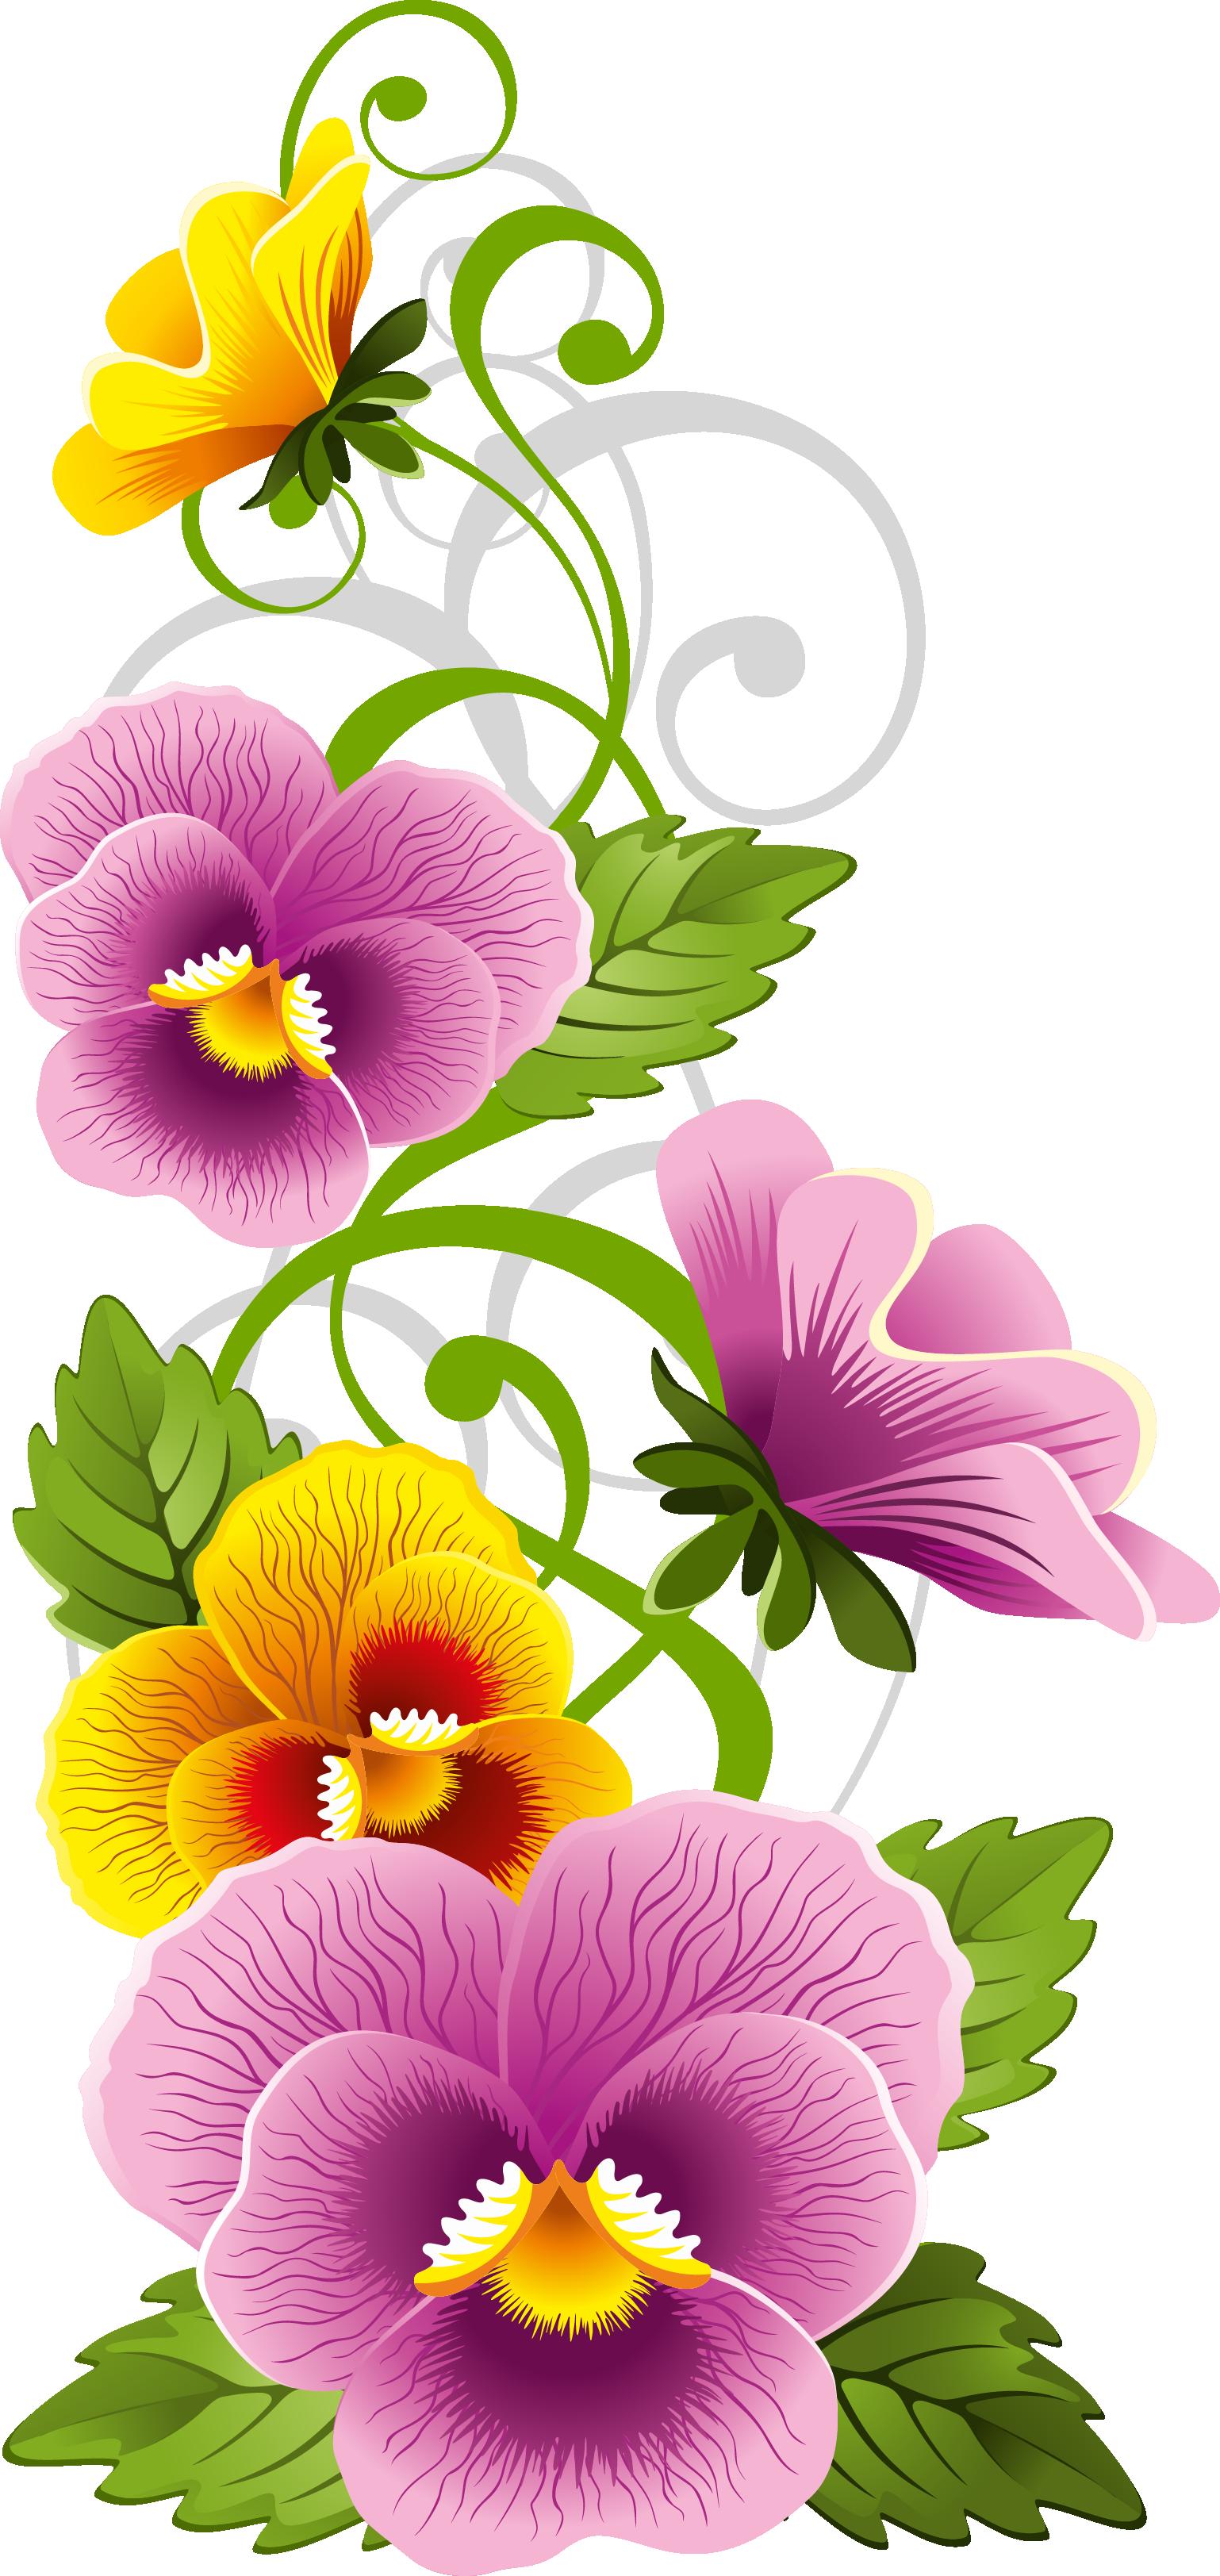 f e aaf. Floral clipart house